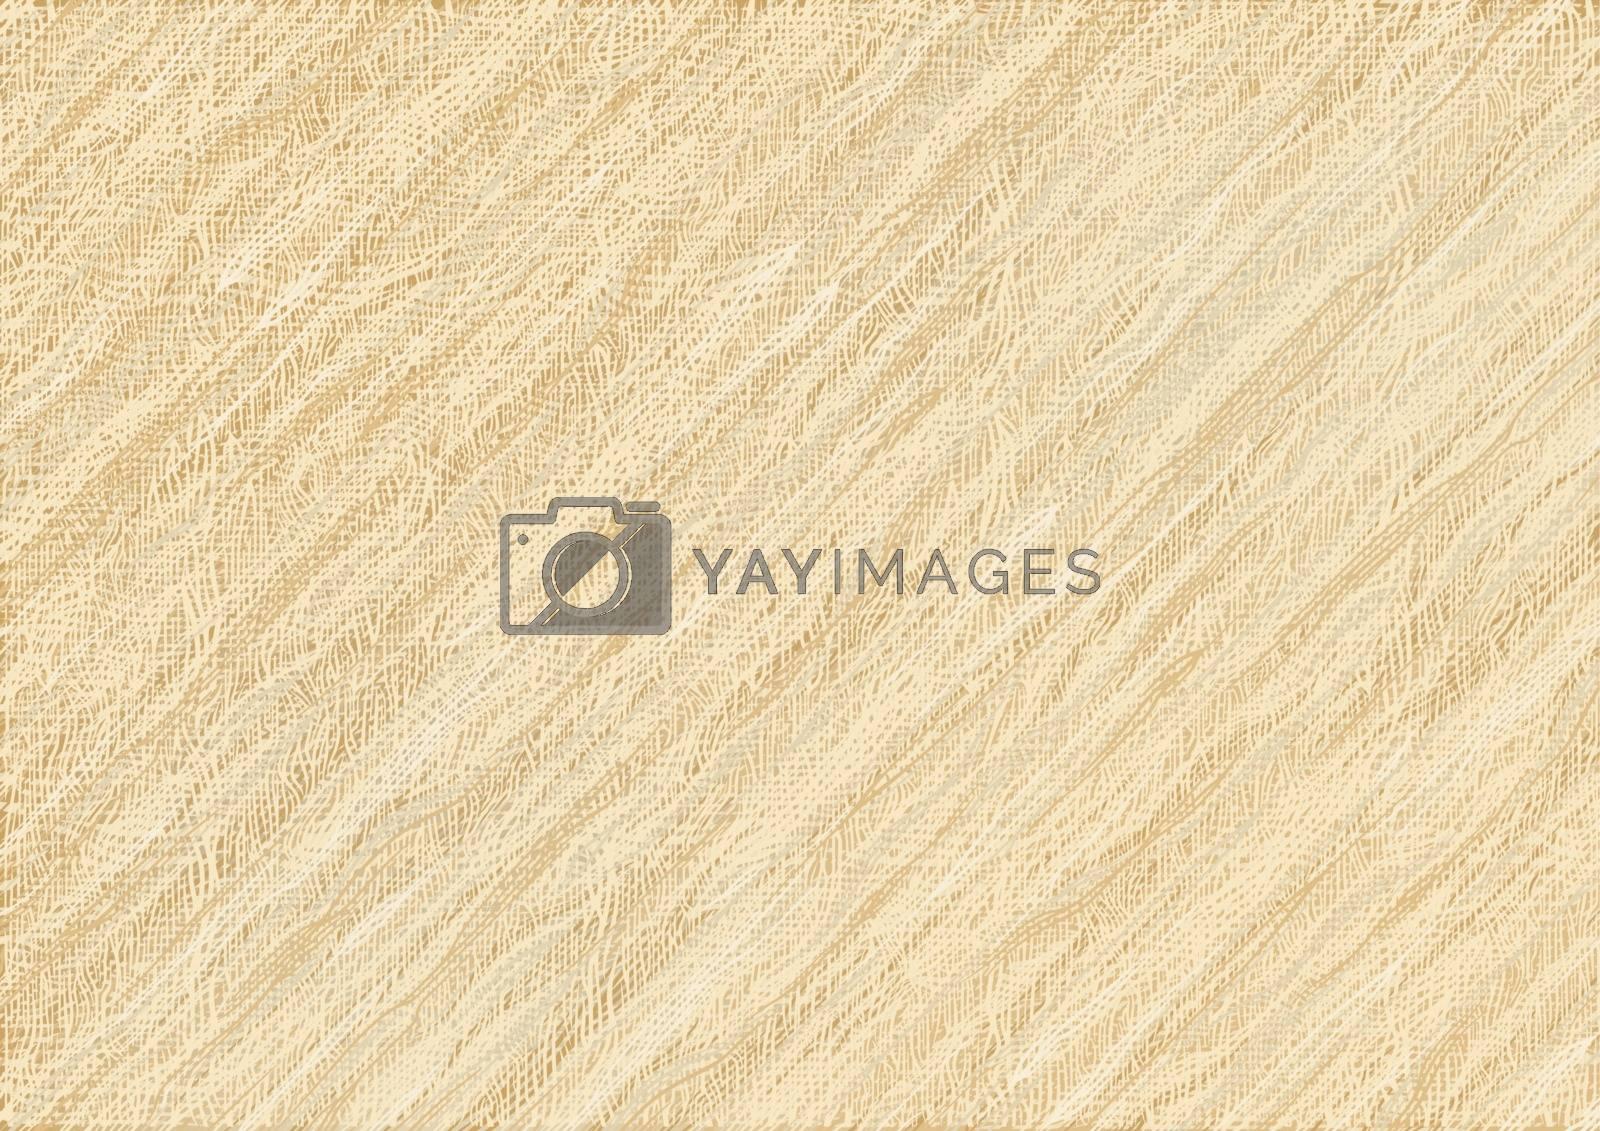 Coarse Fabric Texture by illustratorCZ